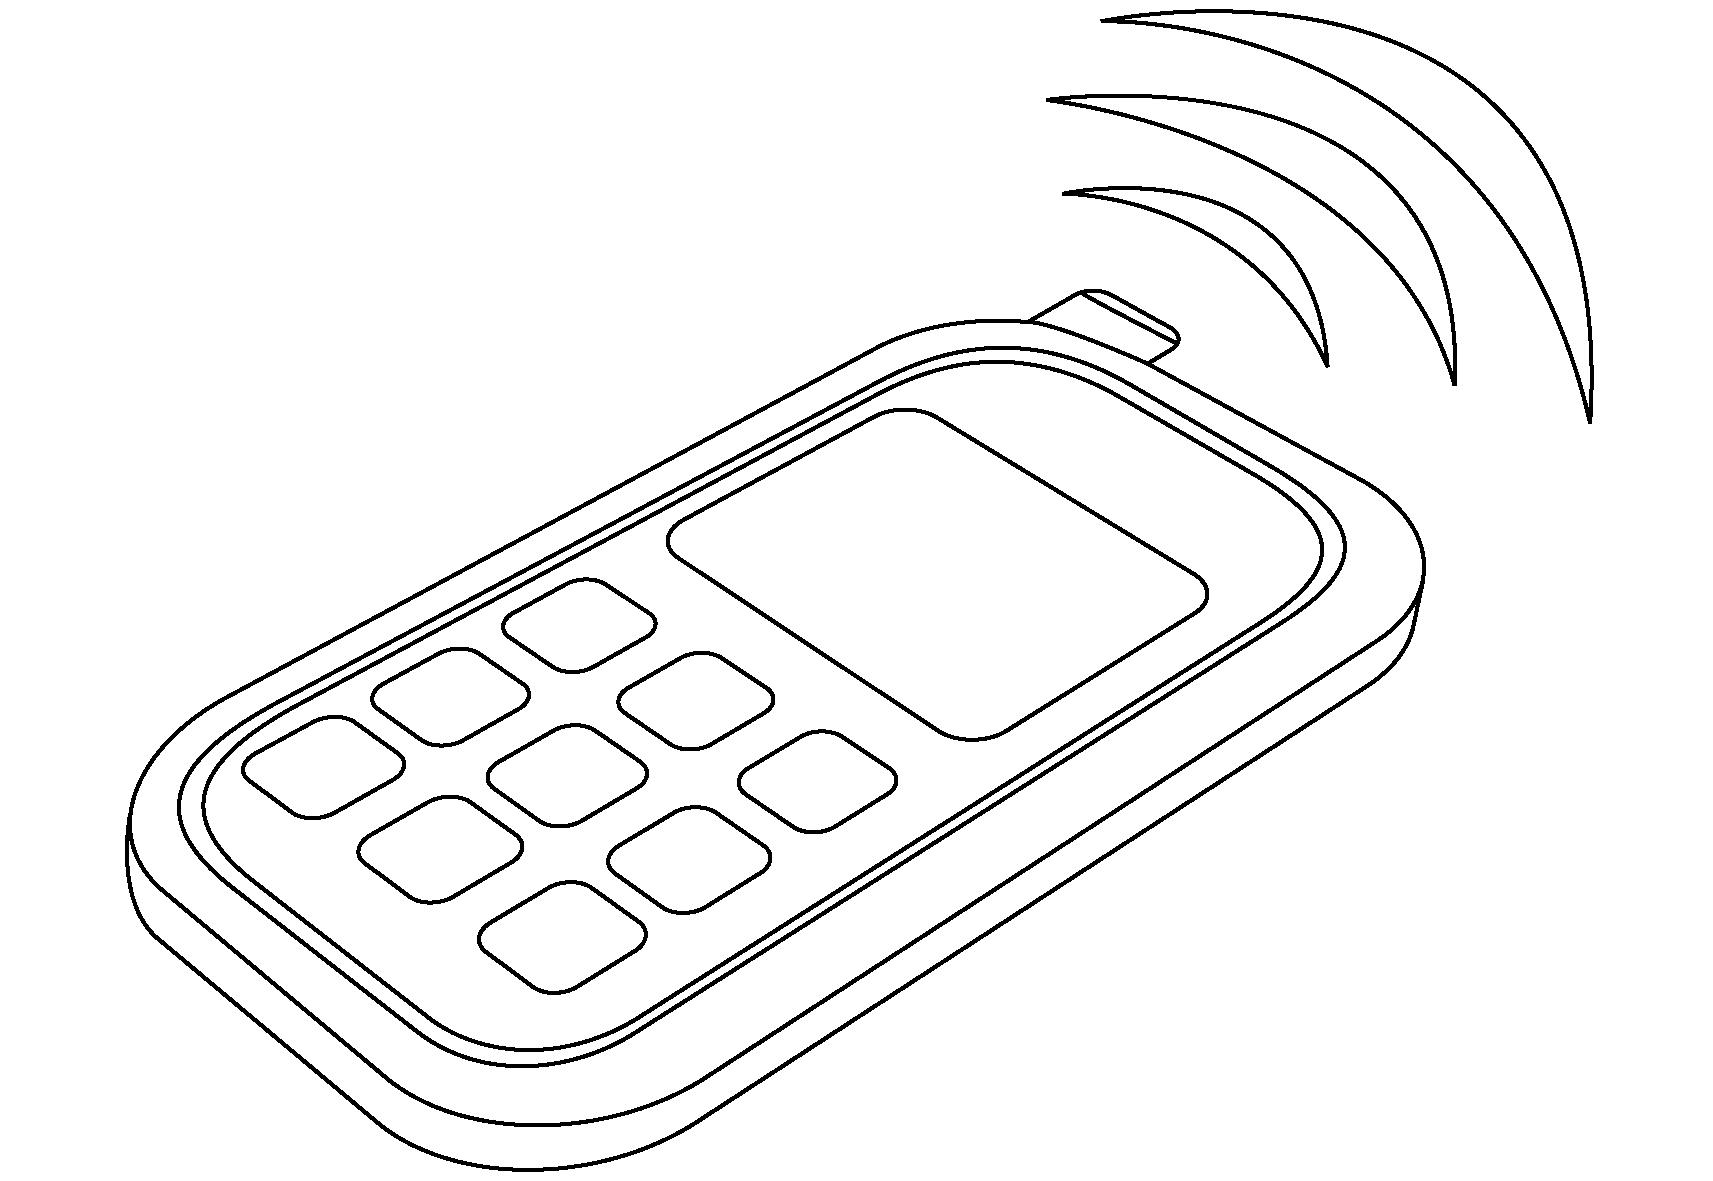 kleurplaat mobiele telefoon ausmalbilder malvorlagen